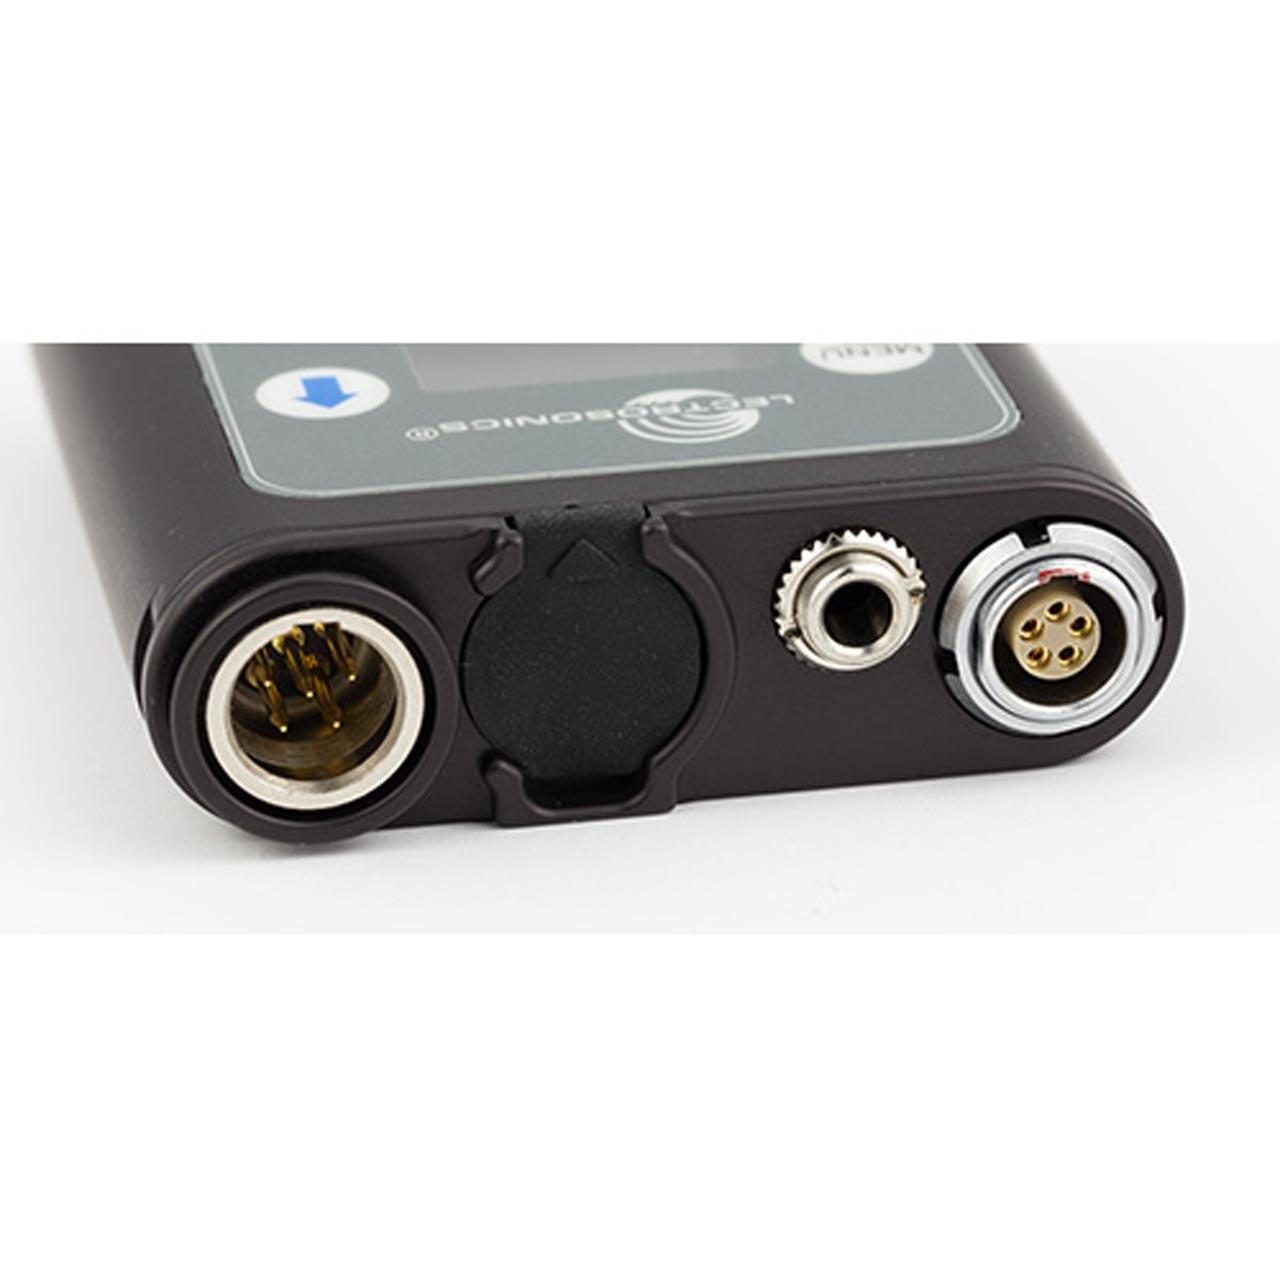 Lectrosonics Lectrosonics - PDR Miniatur Recorder mit Timcode